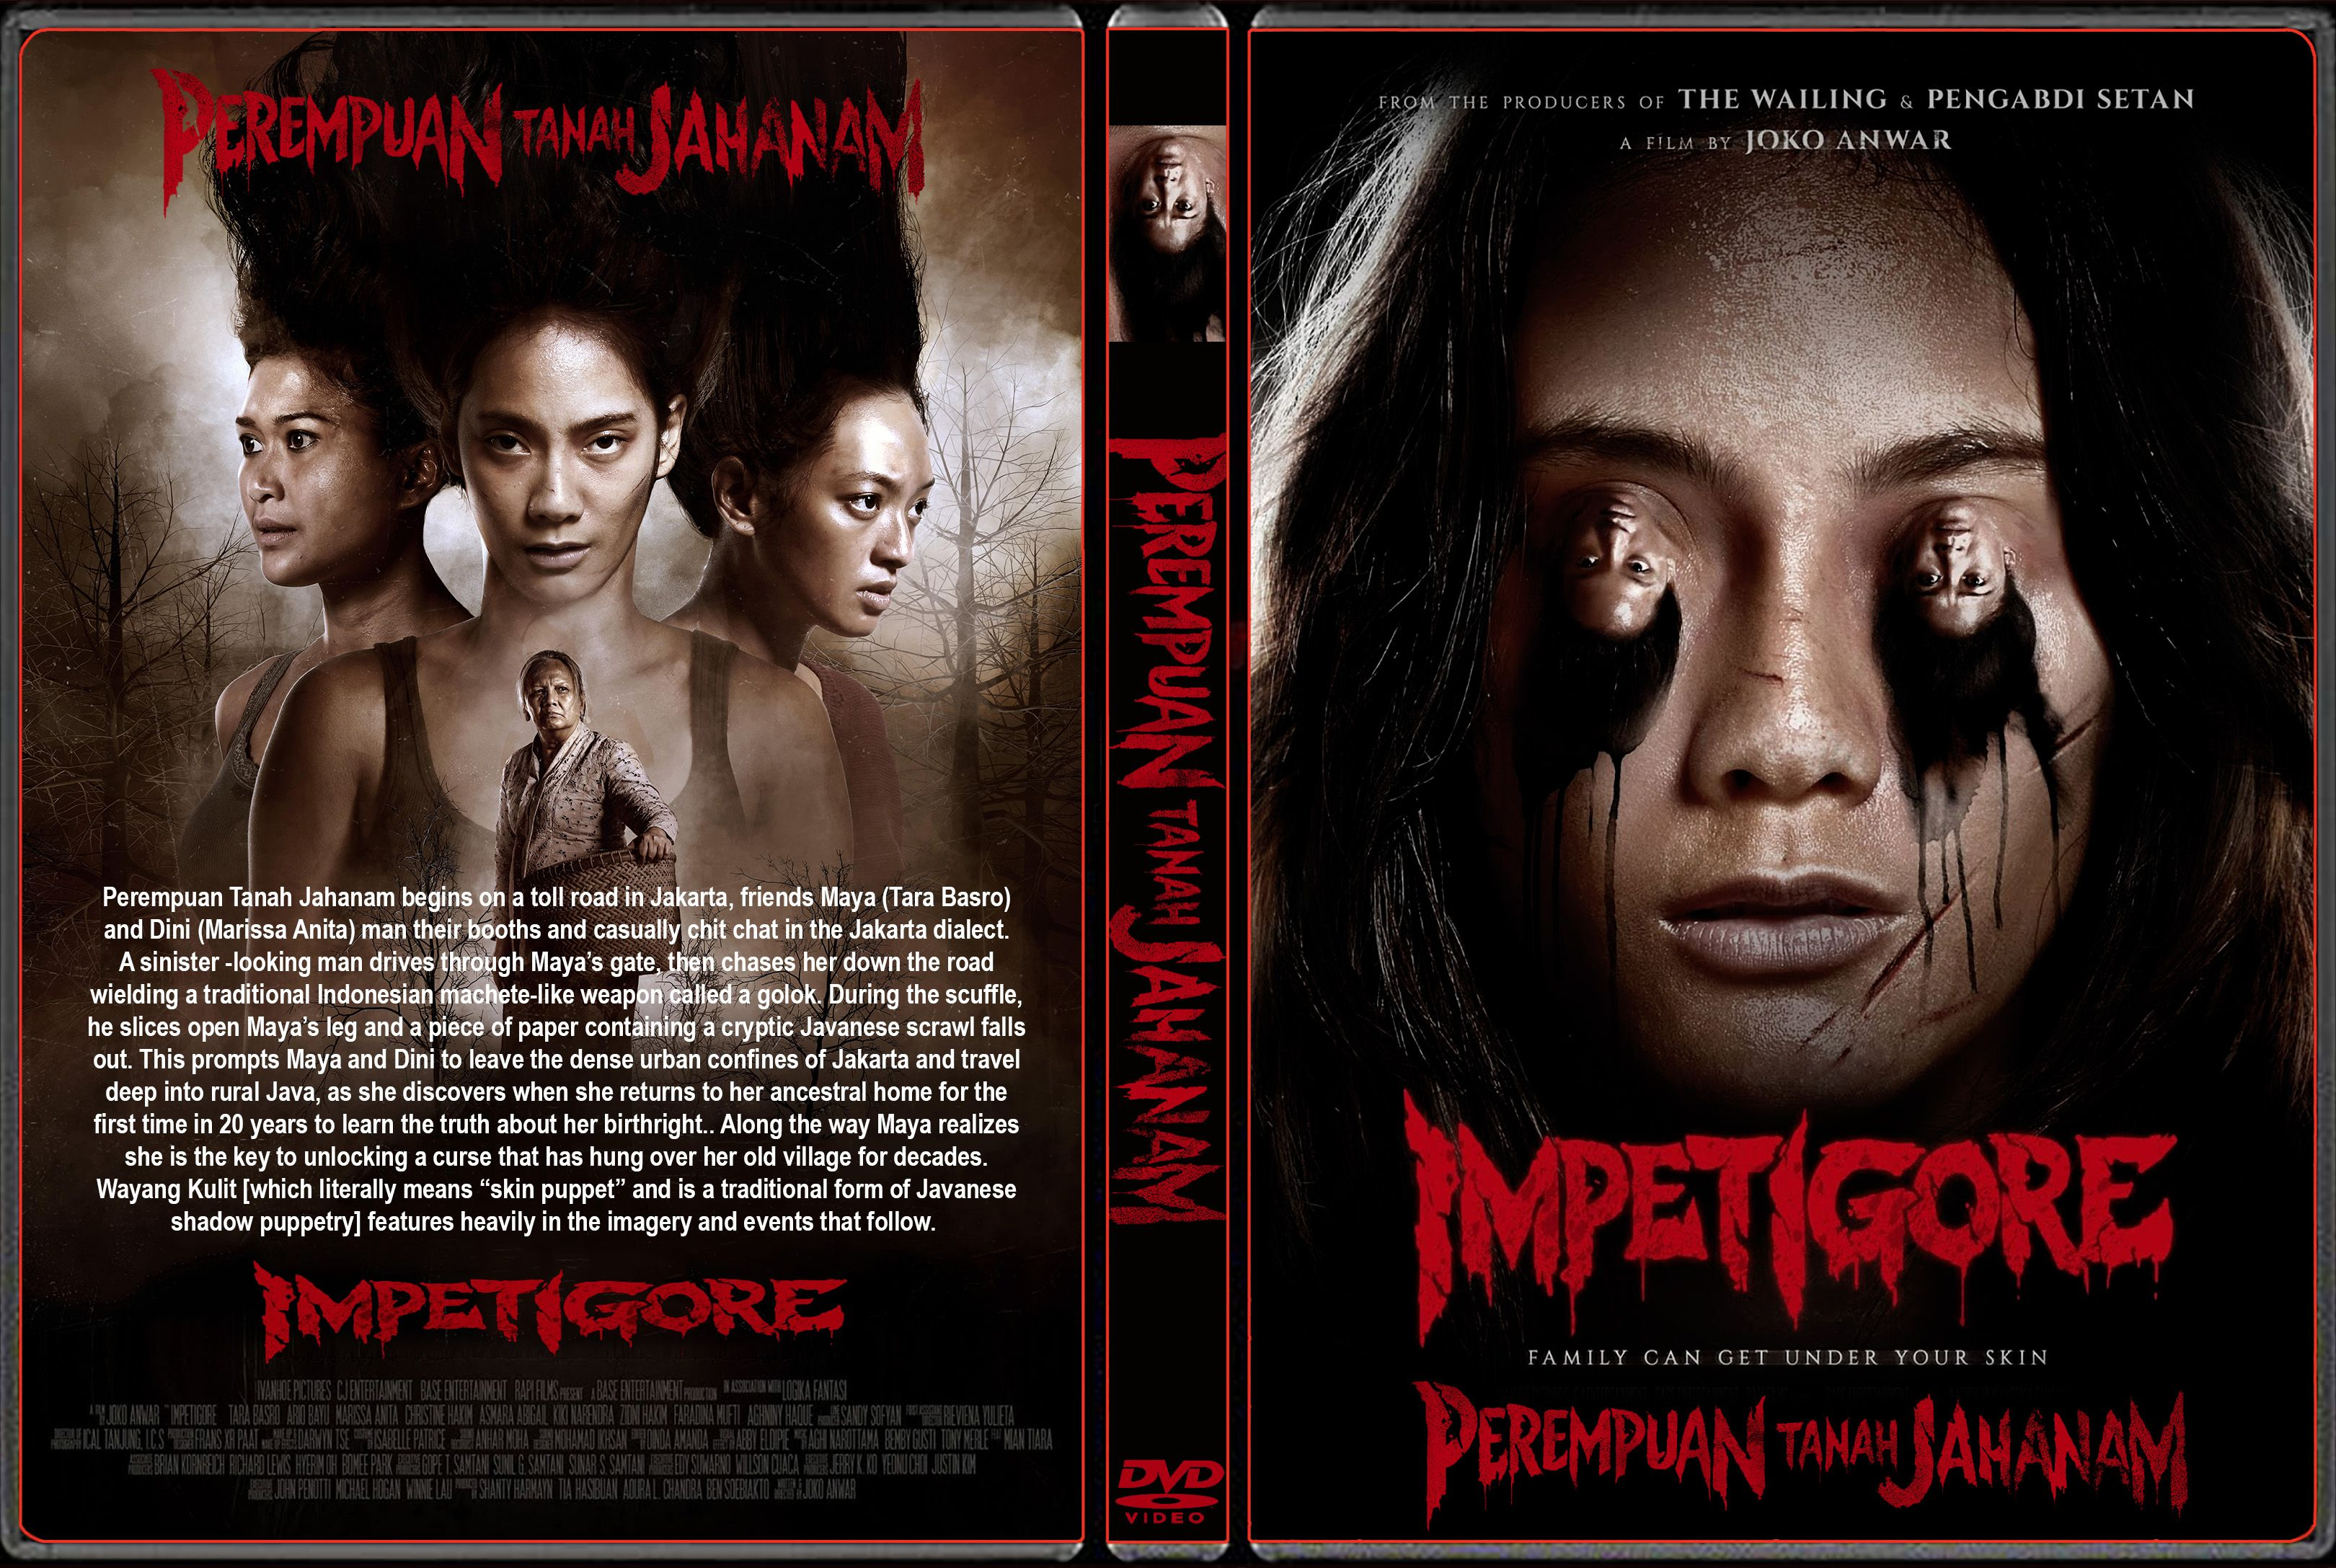 Perempuan Tanah Jahanam Aka Impetigore 2019 In 2021 Dvd Covers Horror Movie Fan Pengabdi Setan